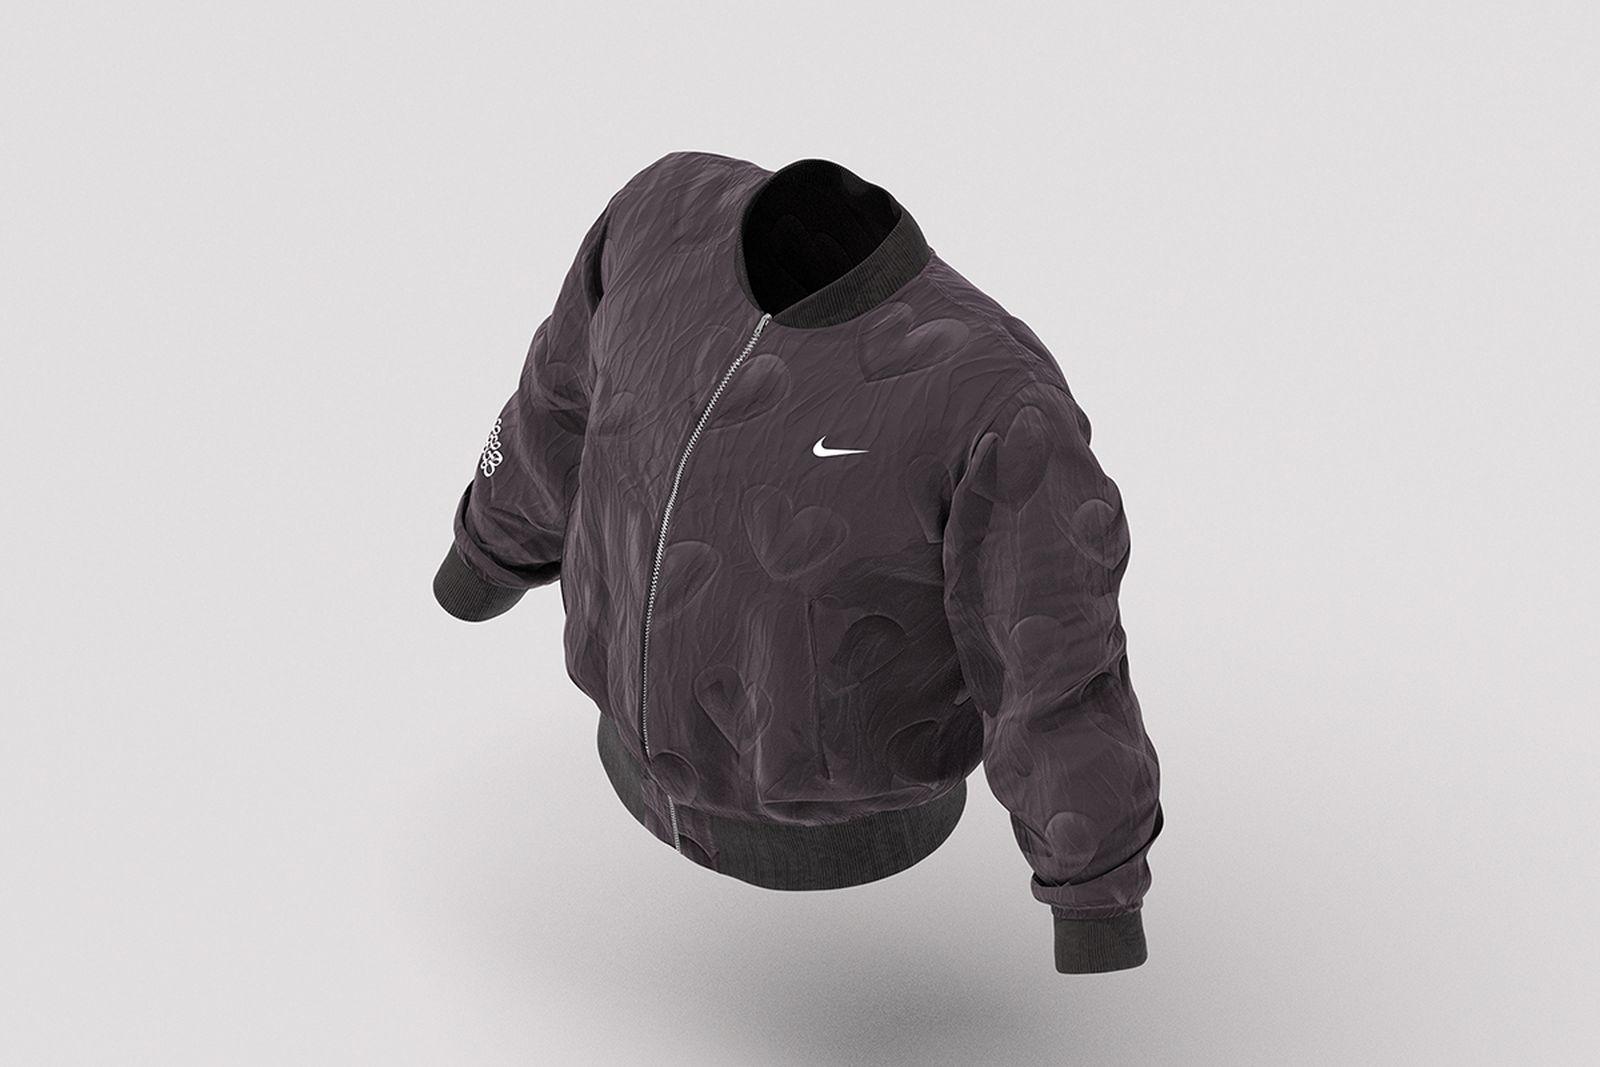 Drake Certified Lover Boy Nike merch